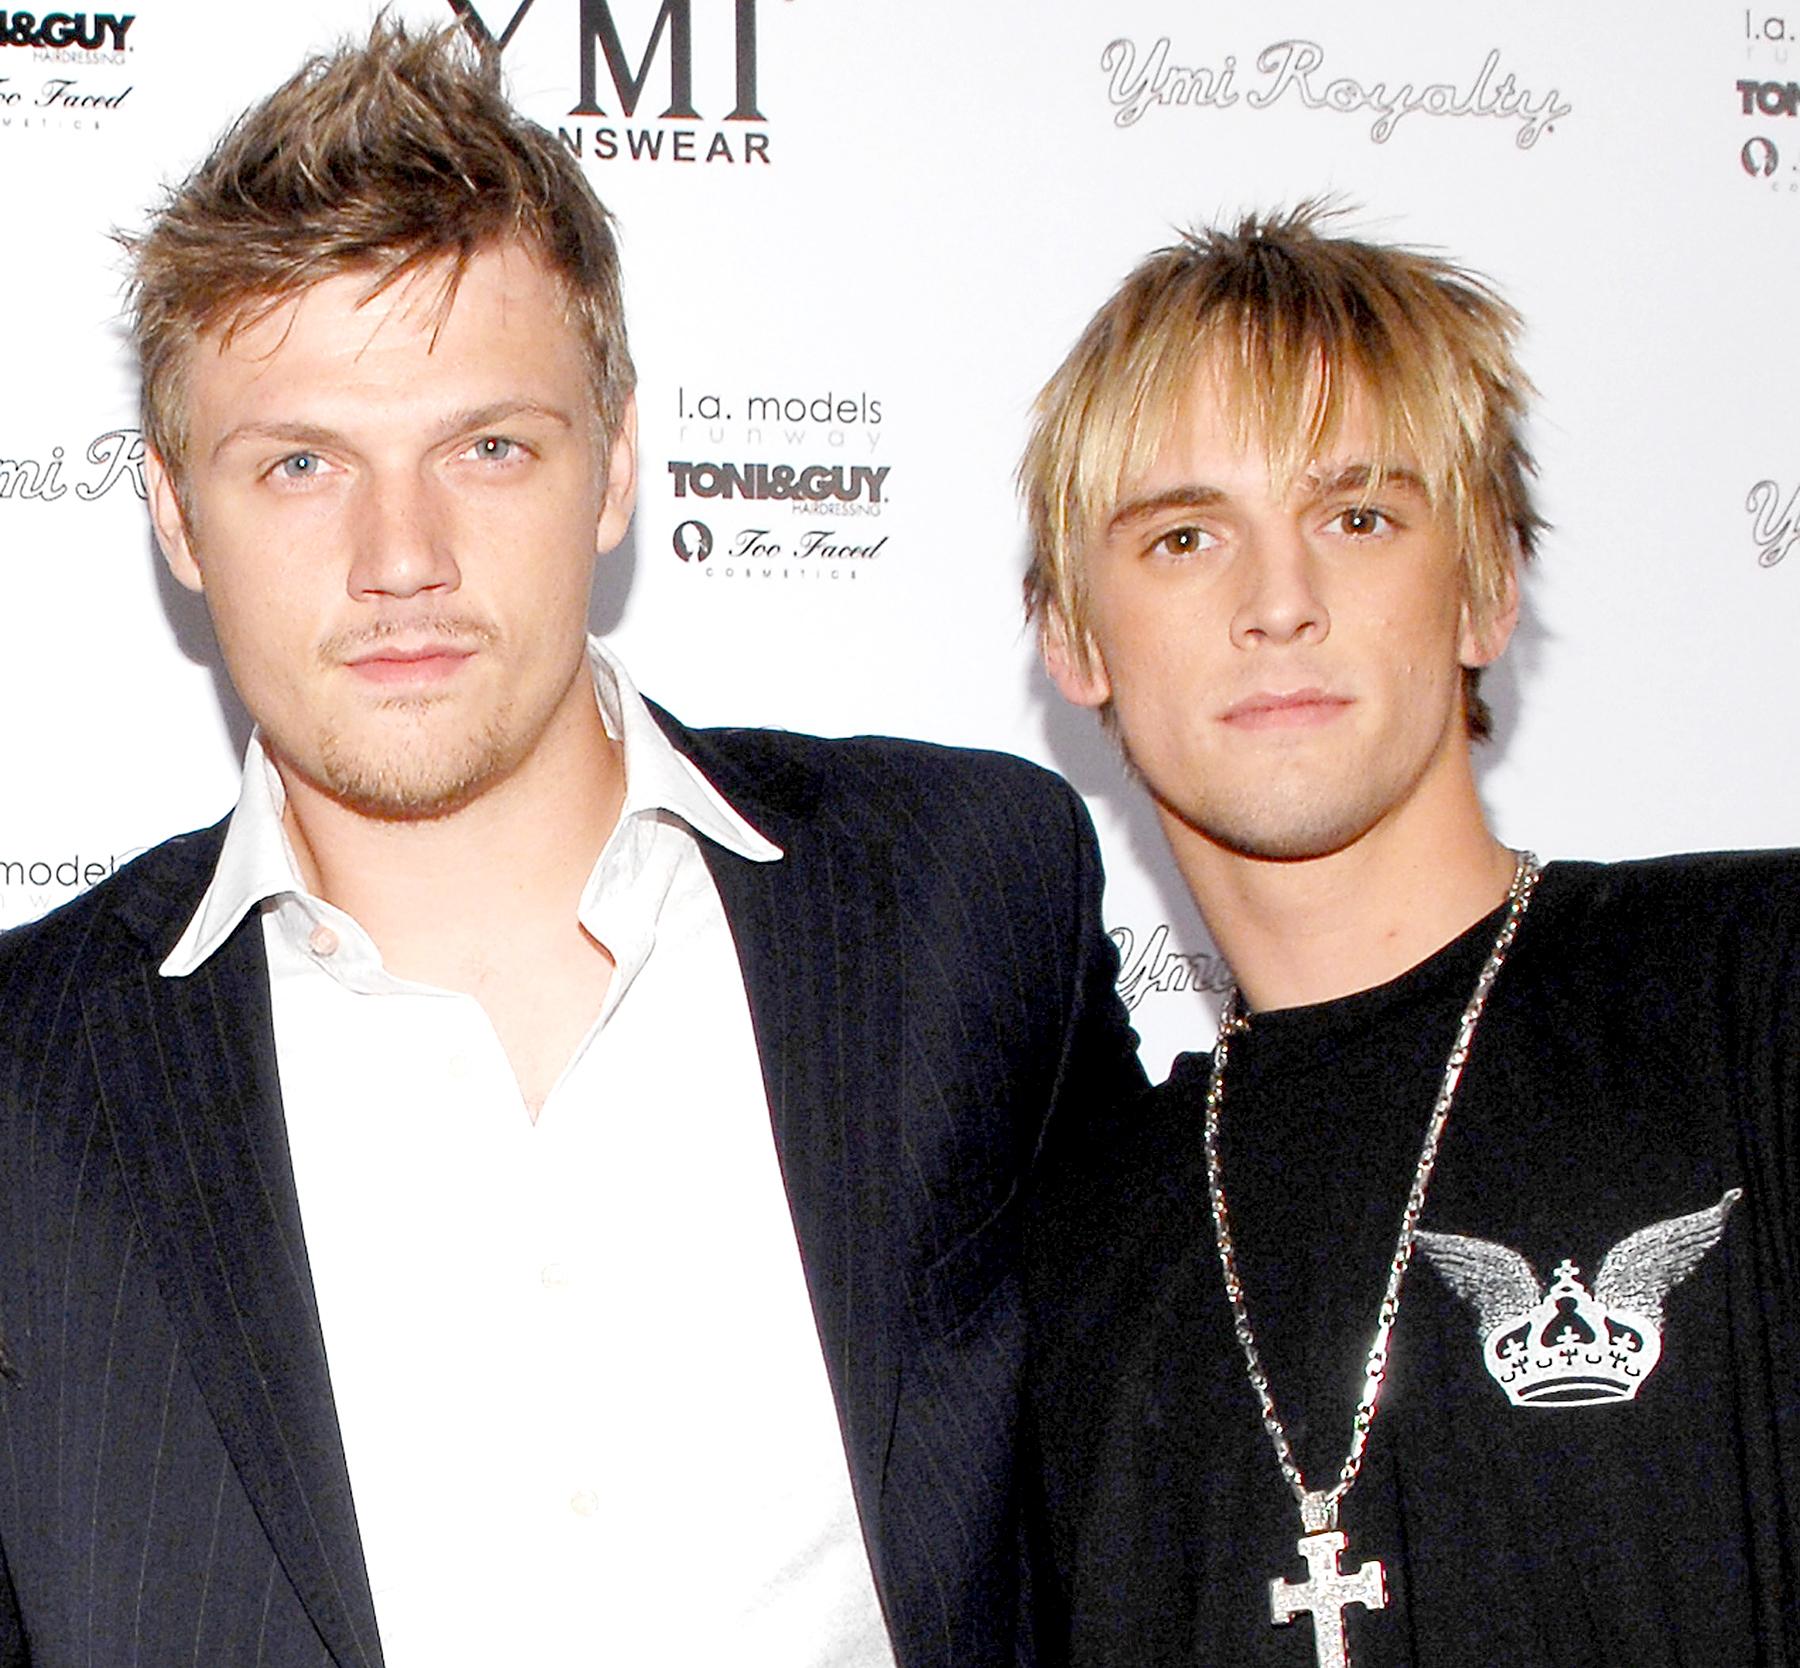 Nick Carter and Aaron Carter in 2006.